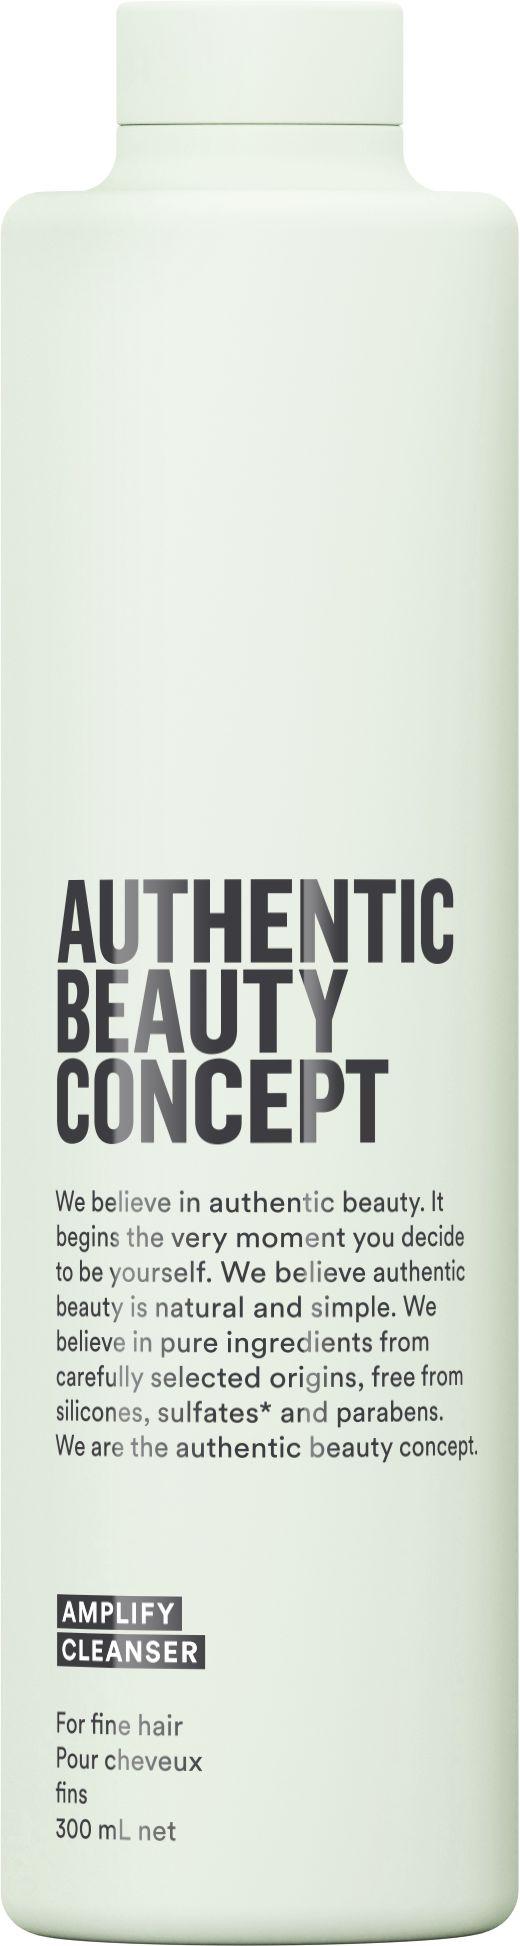 Authentic Beauty Concept Amplify Szampon Wzmacniający 300ml